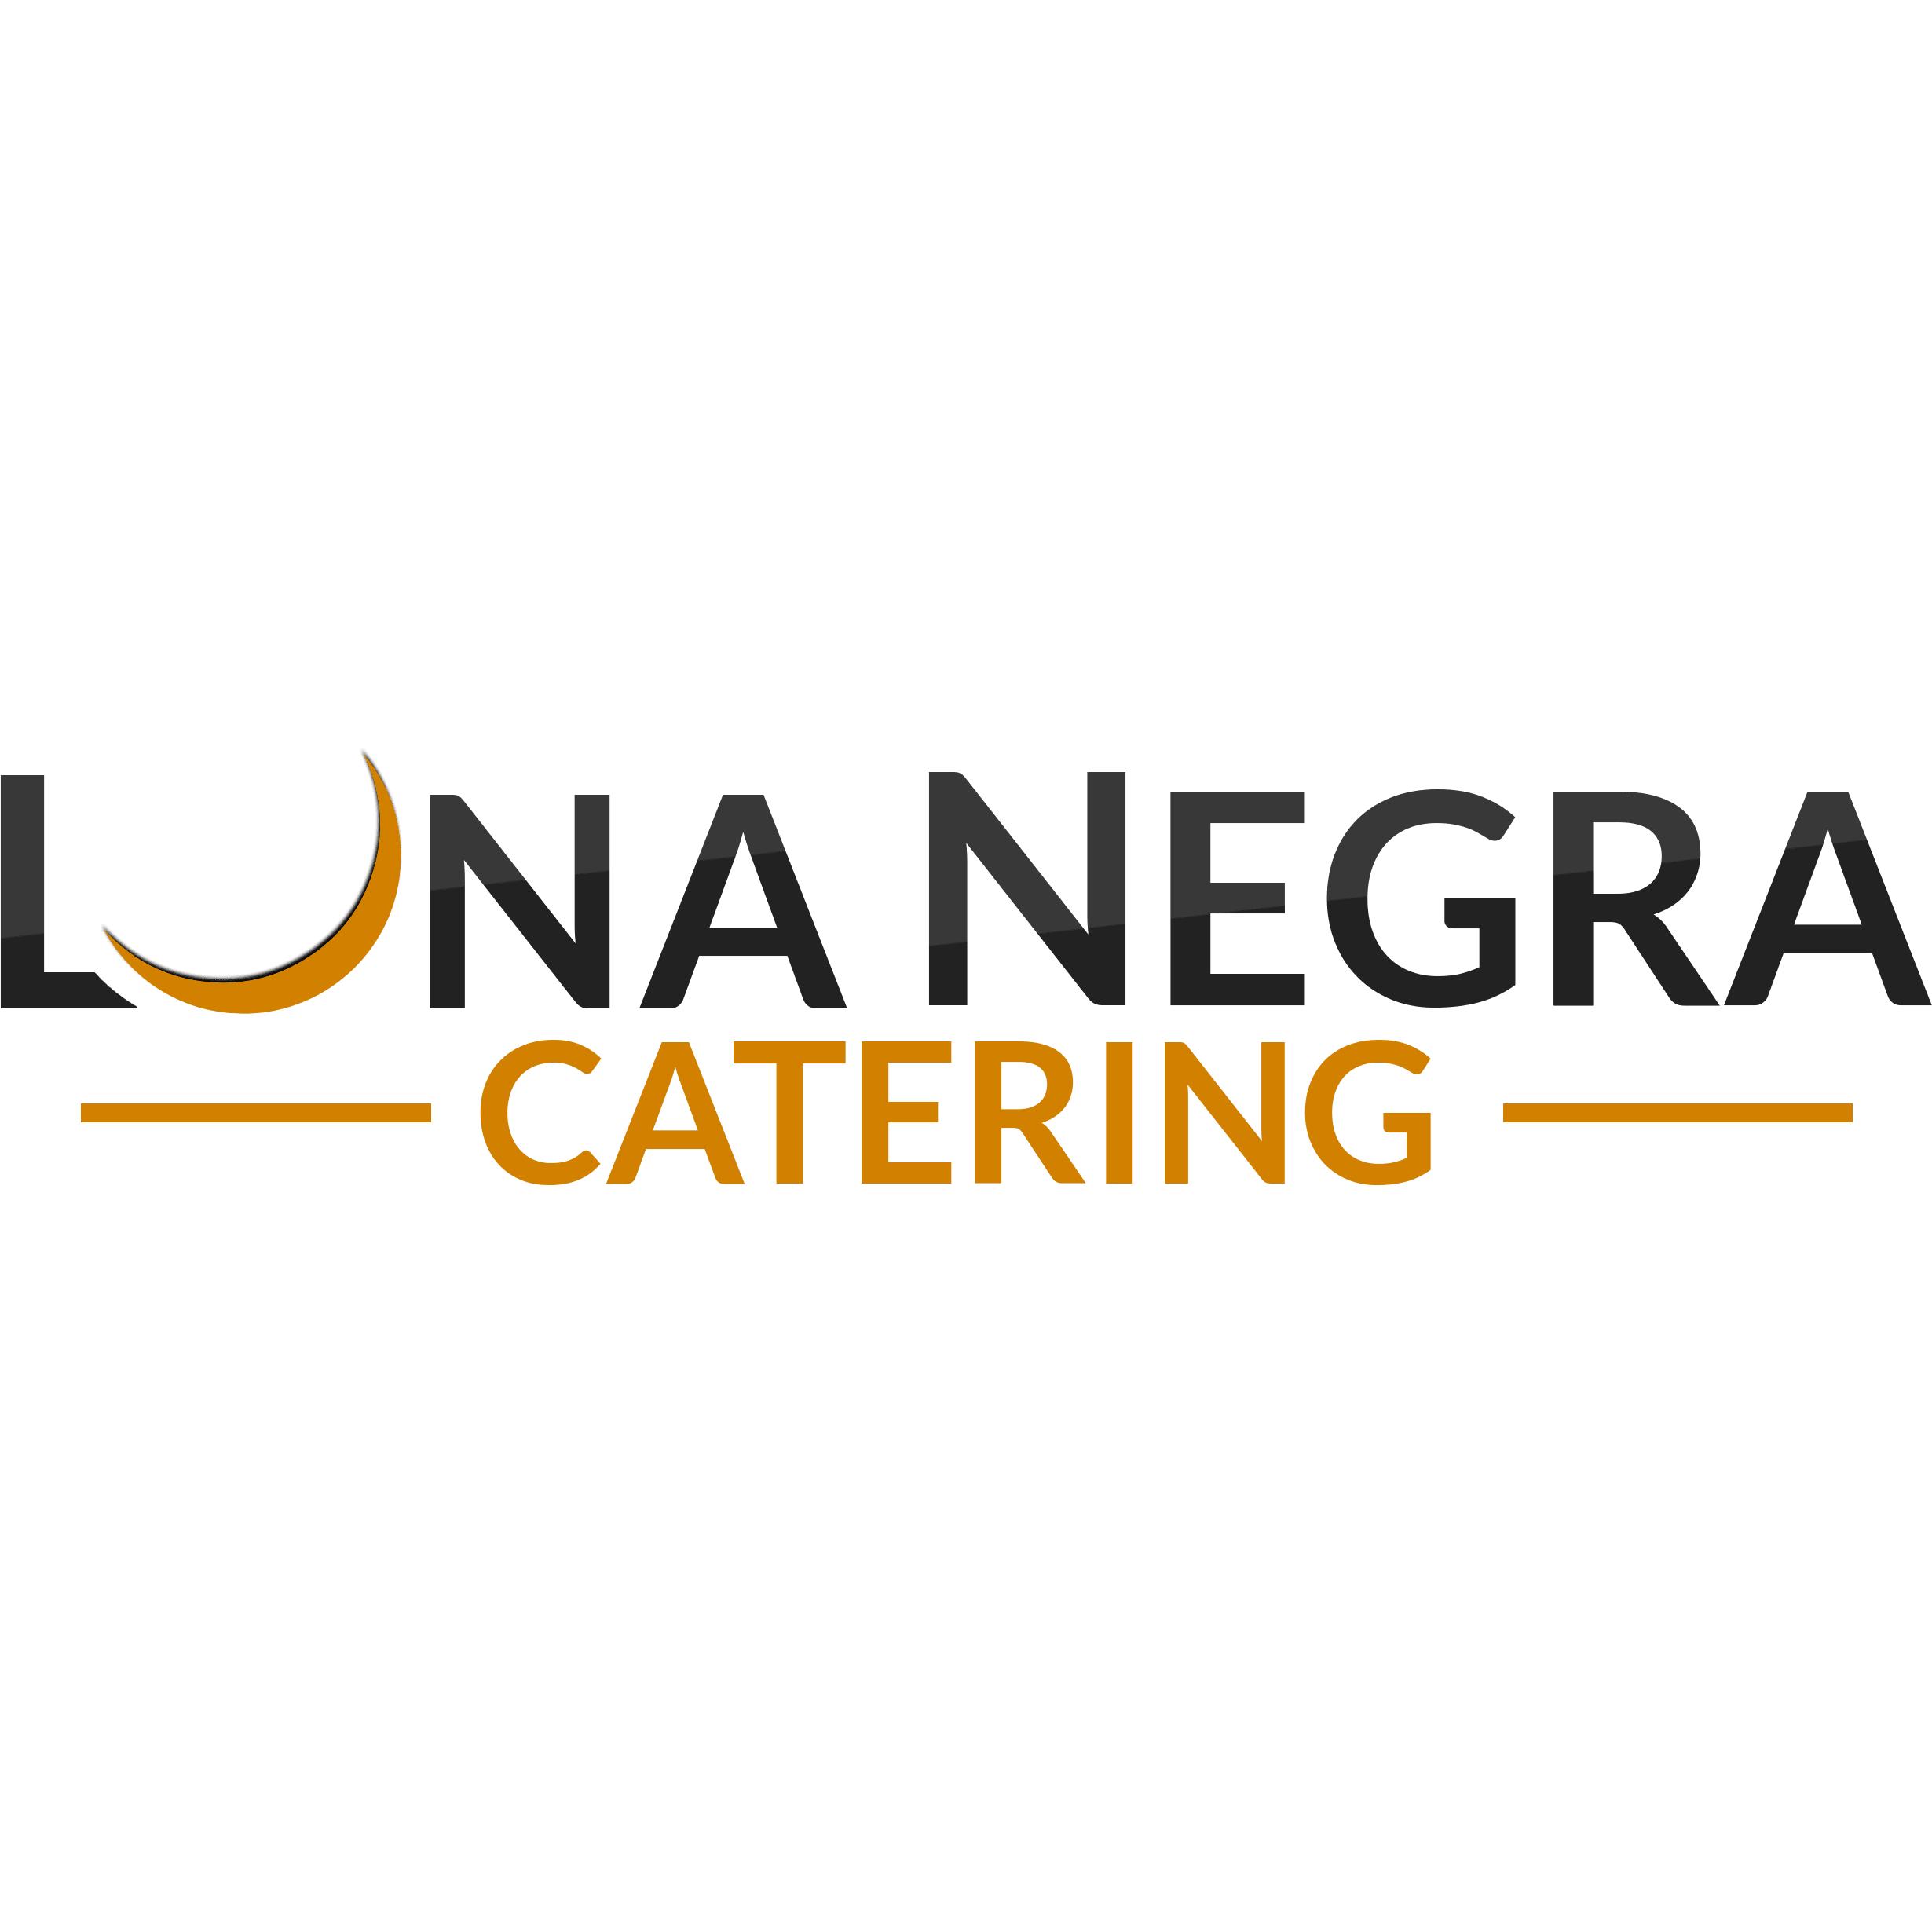 Luna Negra Catering